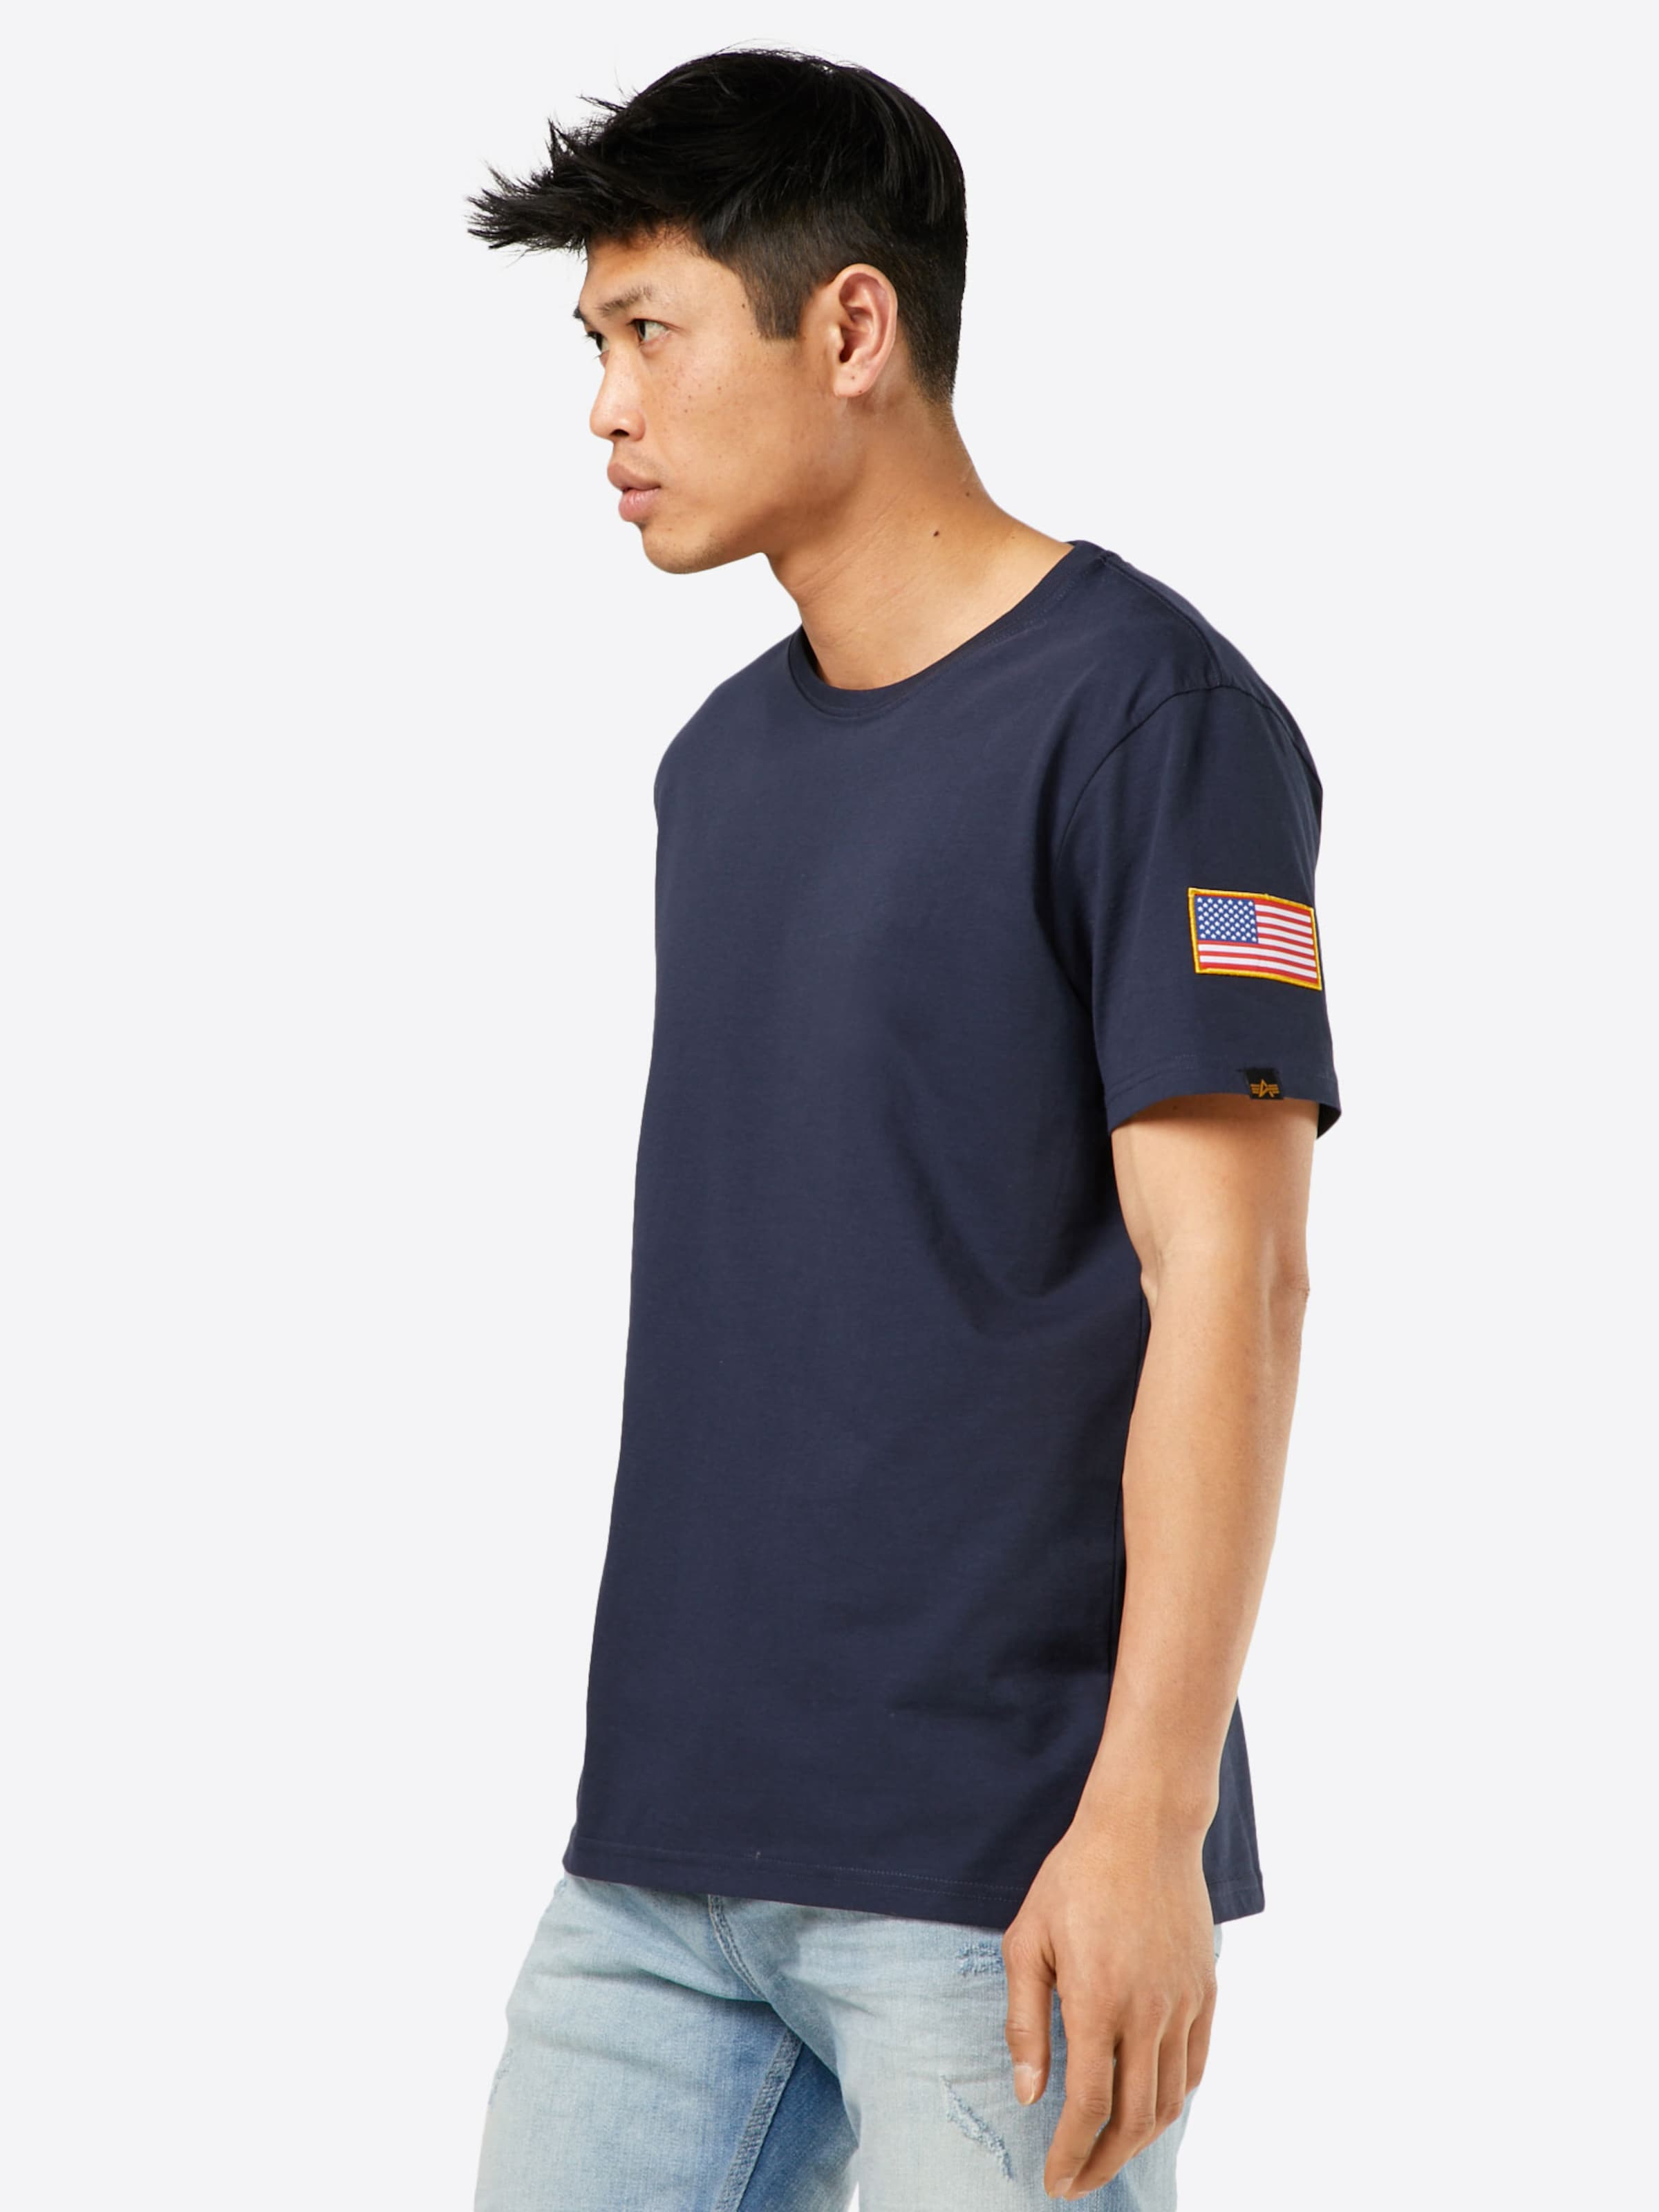 Industries 'nasa' Alpha Dunkelblau In Shirt wnXO8Pk0